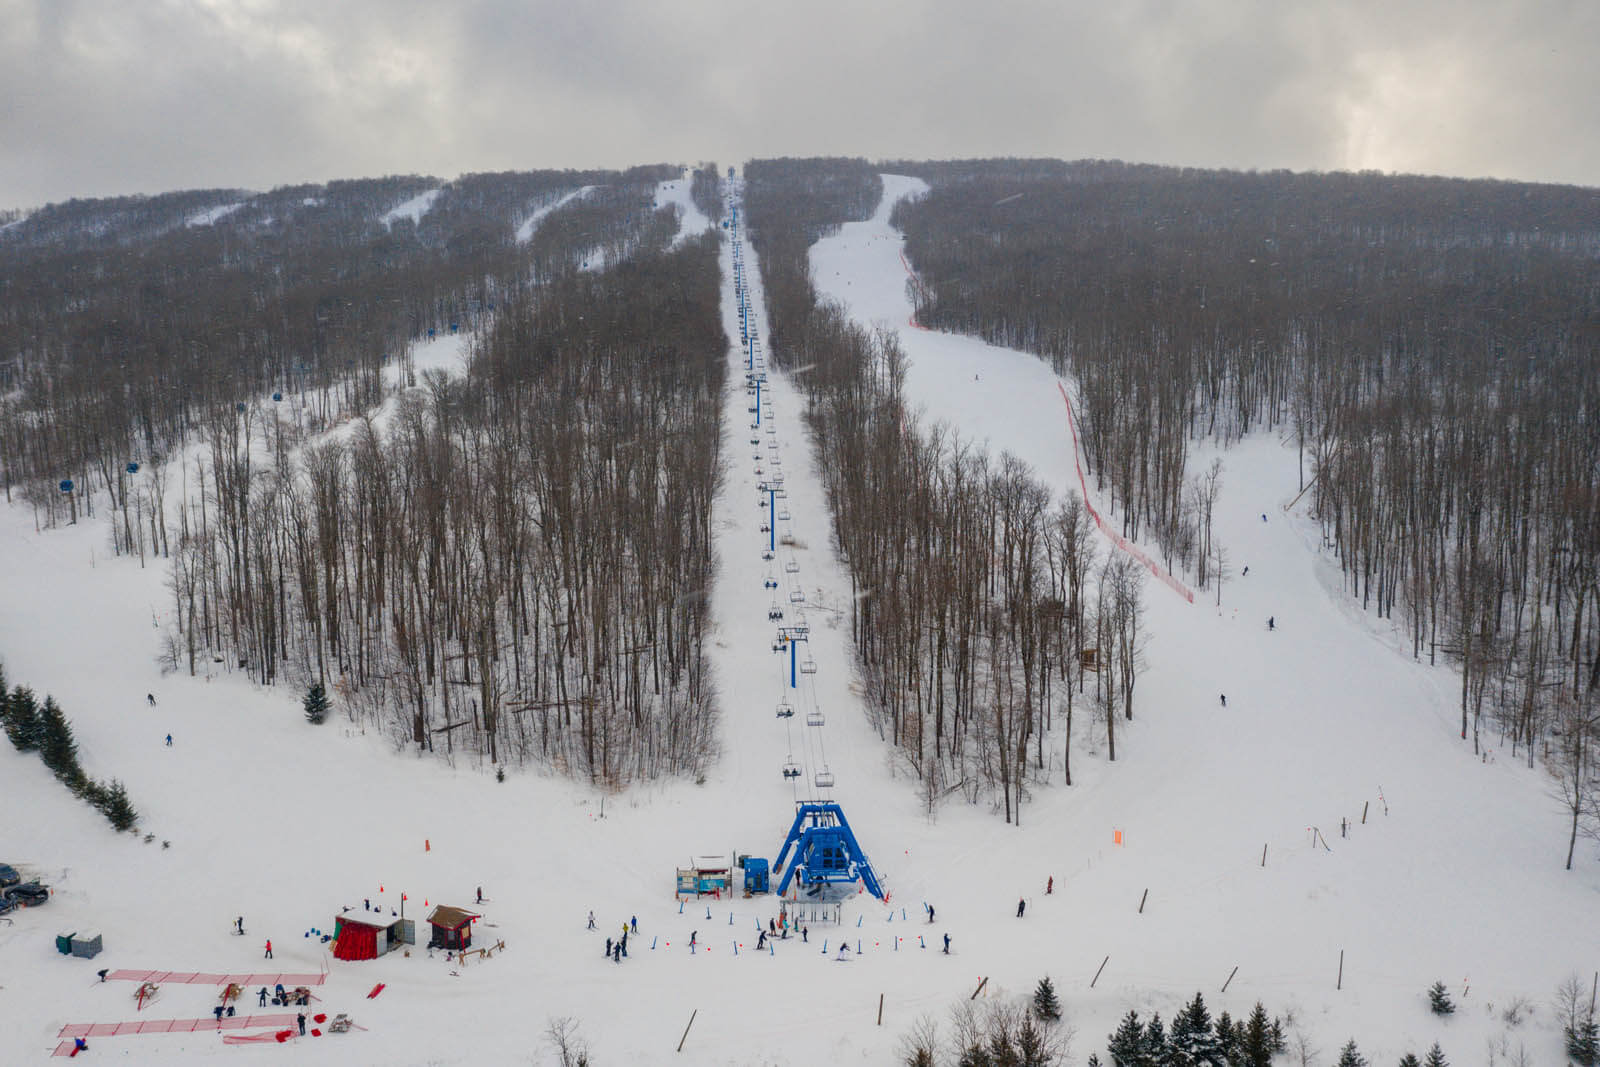 aerial view of Bellayre Ski Resort near Phoenicia New York in the Catskills